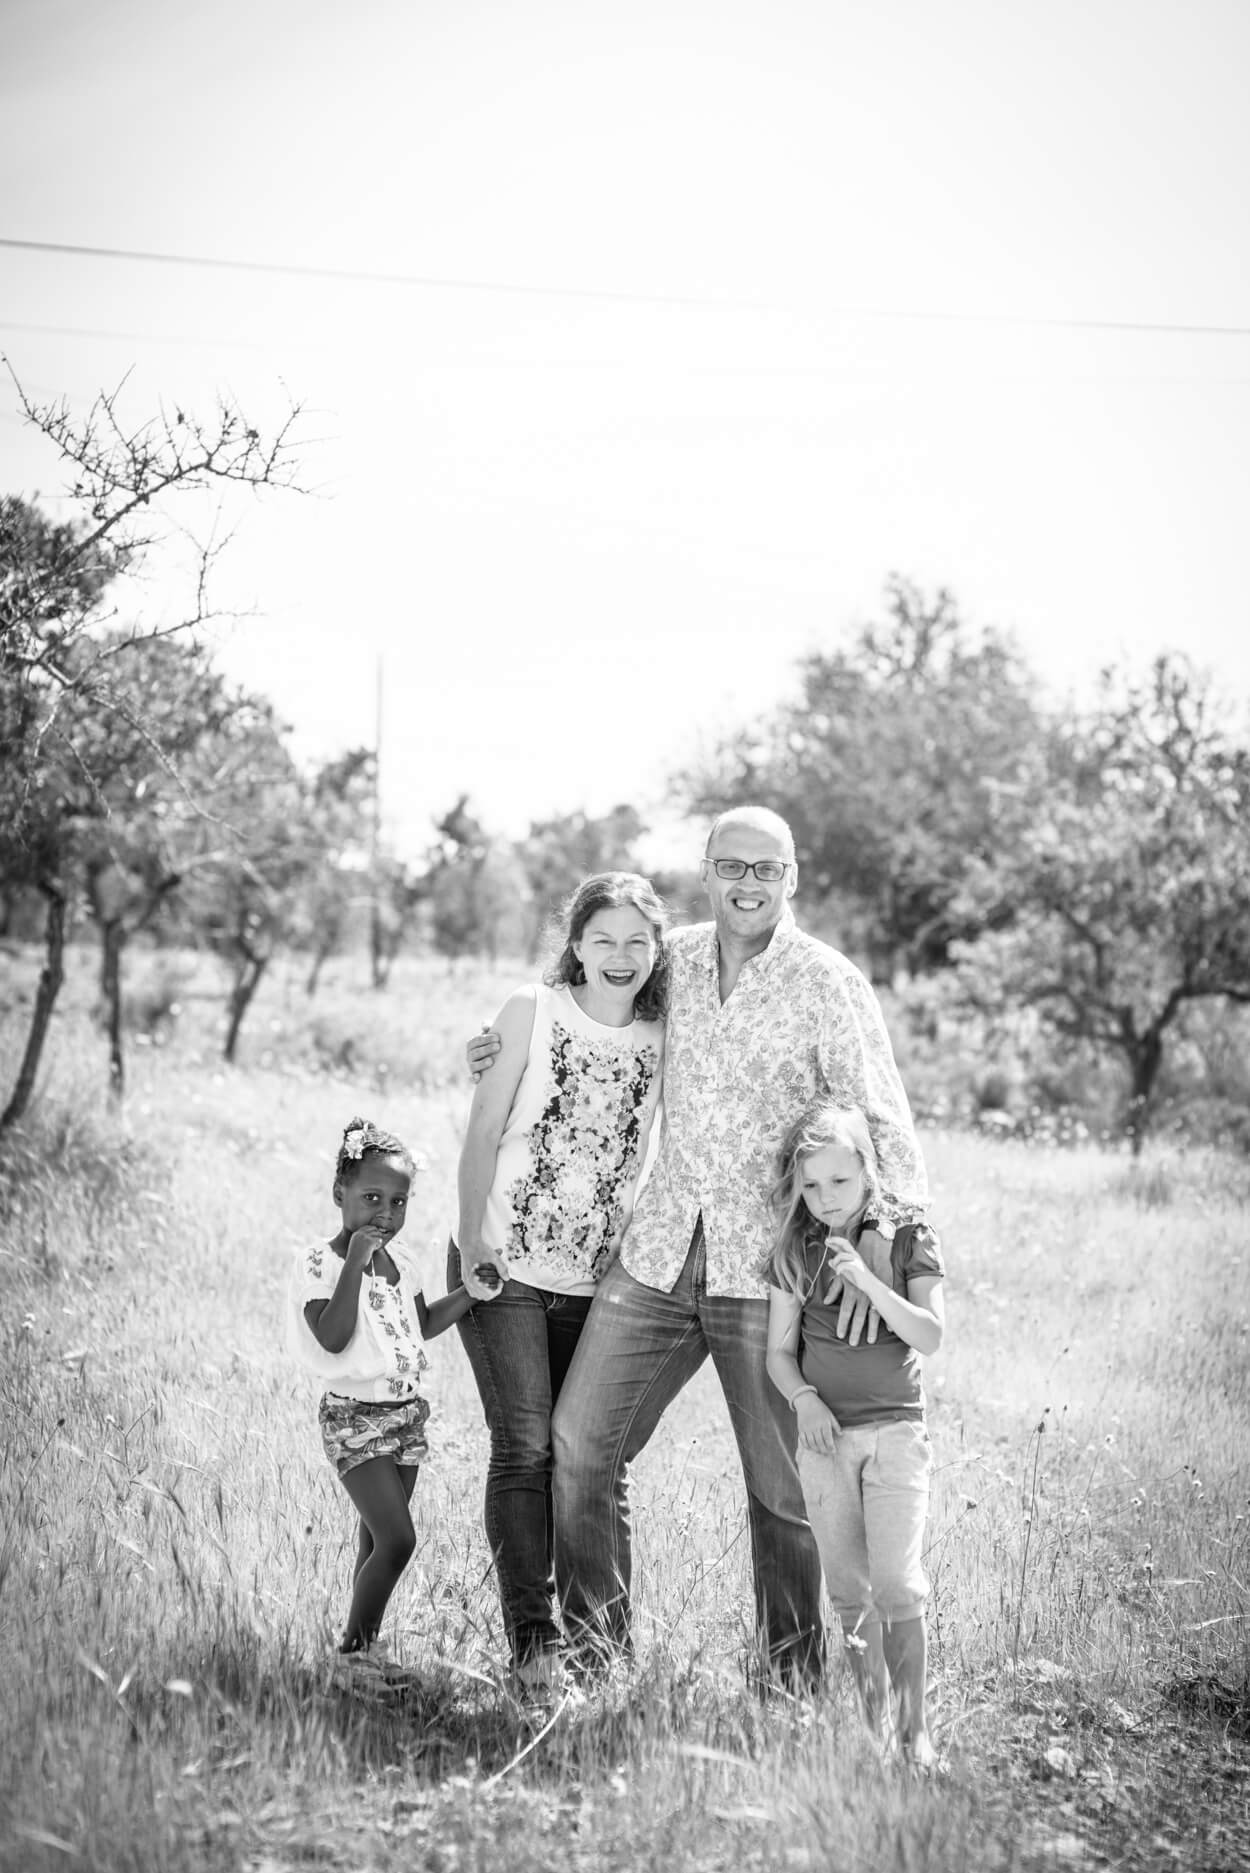 parents kids portrait countryside summer field natural light